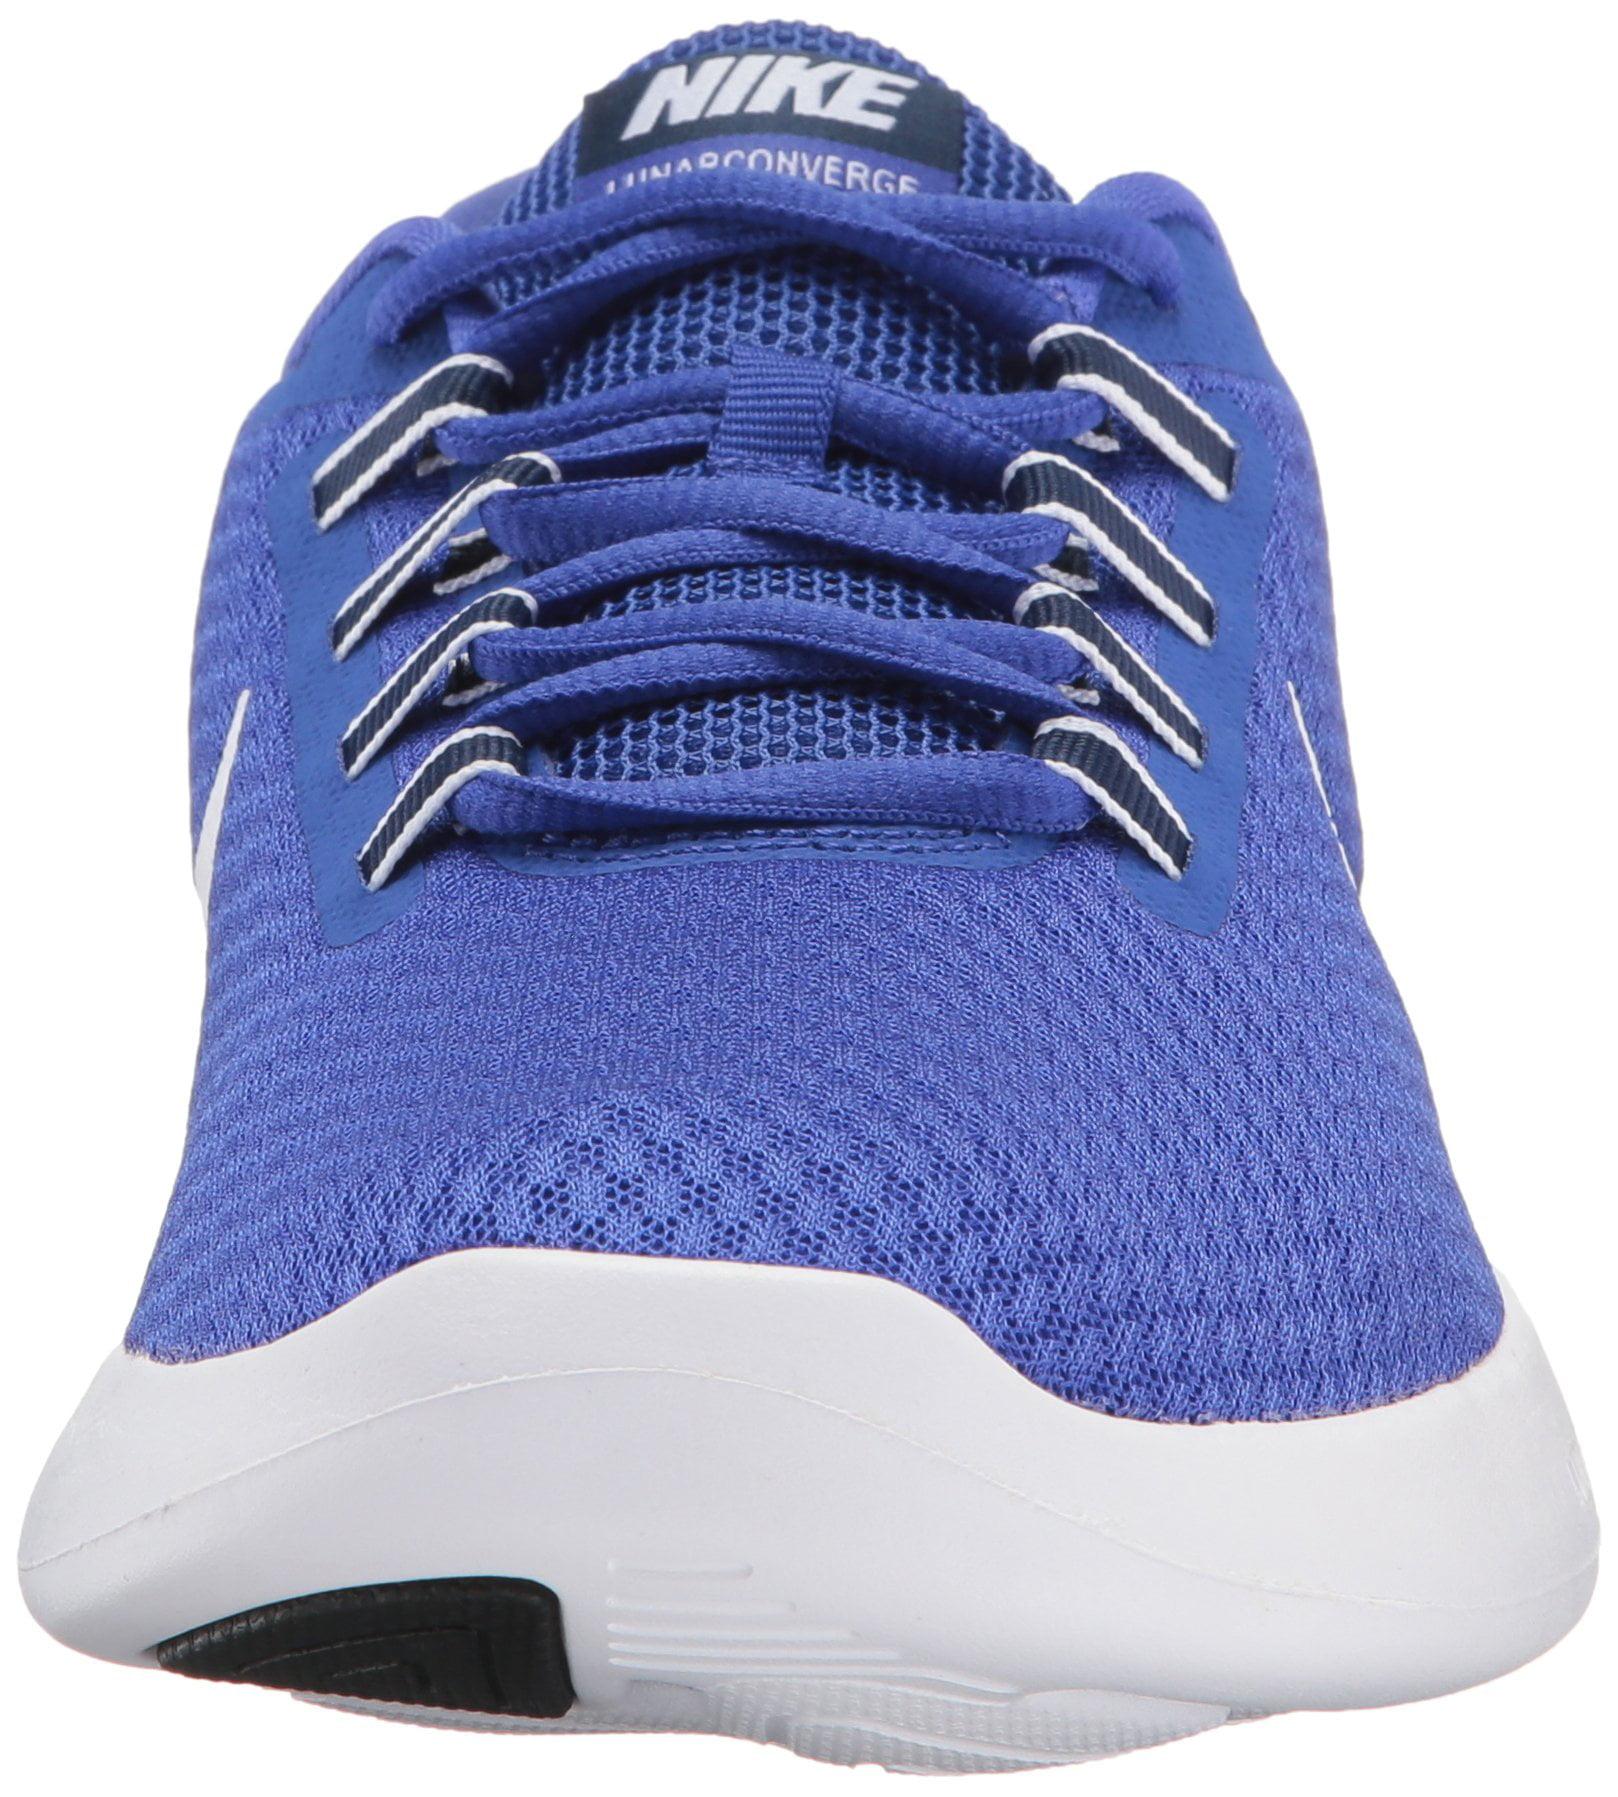 NIKE Men's LunarConverge Running Shoe, Paramount Blue/White/Binary Blue/Black, 12 D(M) US